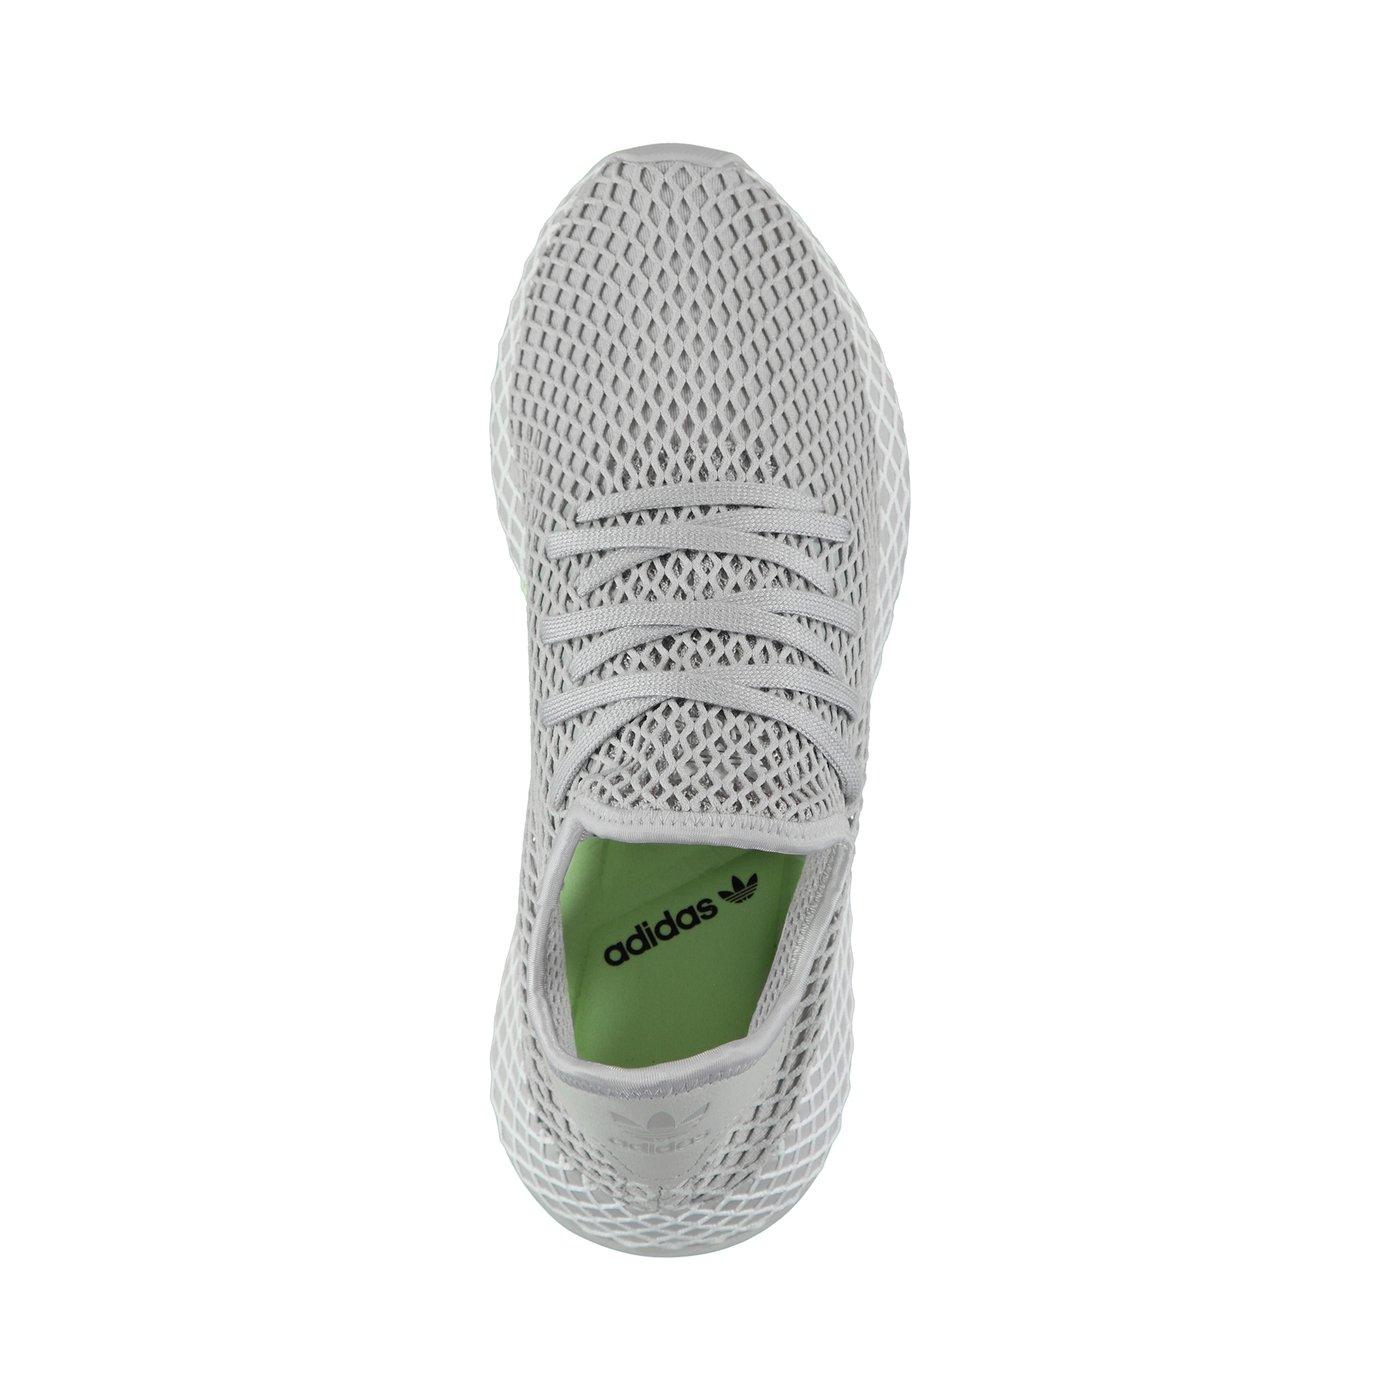 adidas Originals Deerupt Runner Erkek Gri Spor Ayakkabı